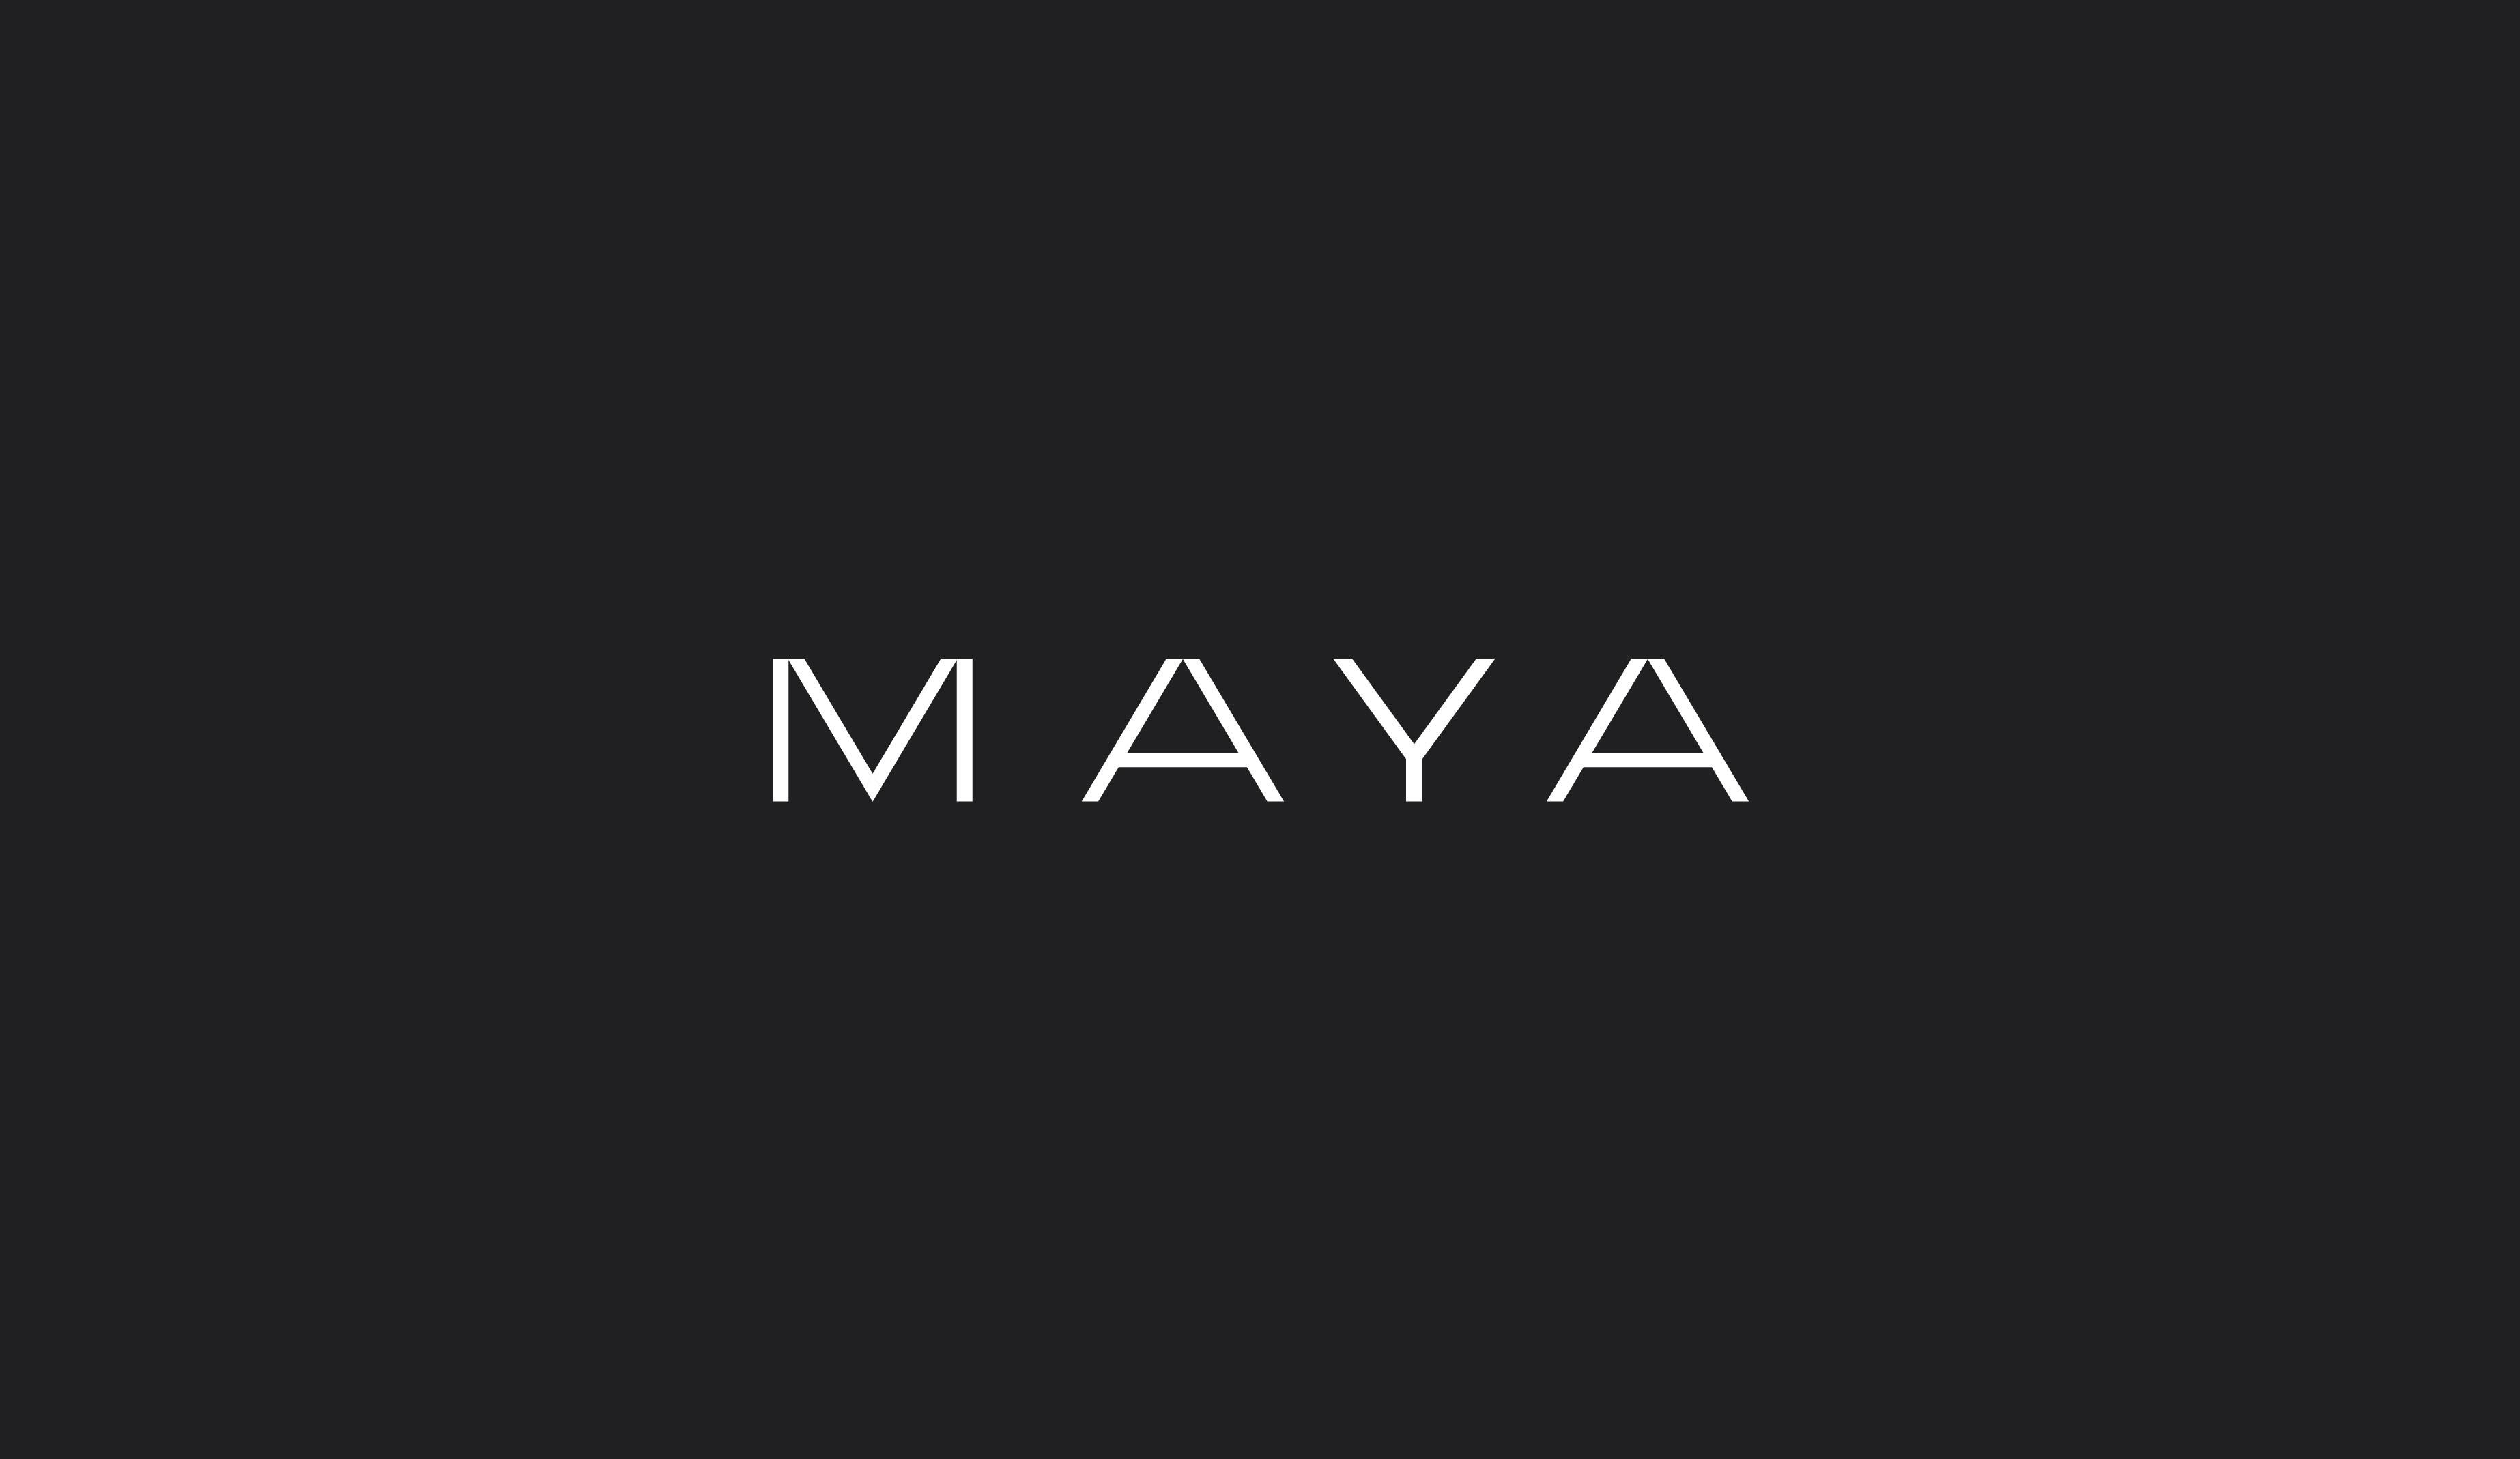 Maya logo design